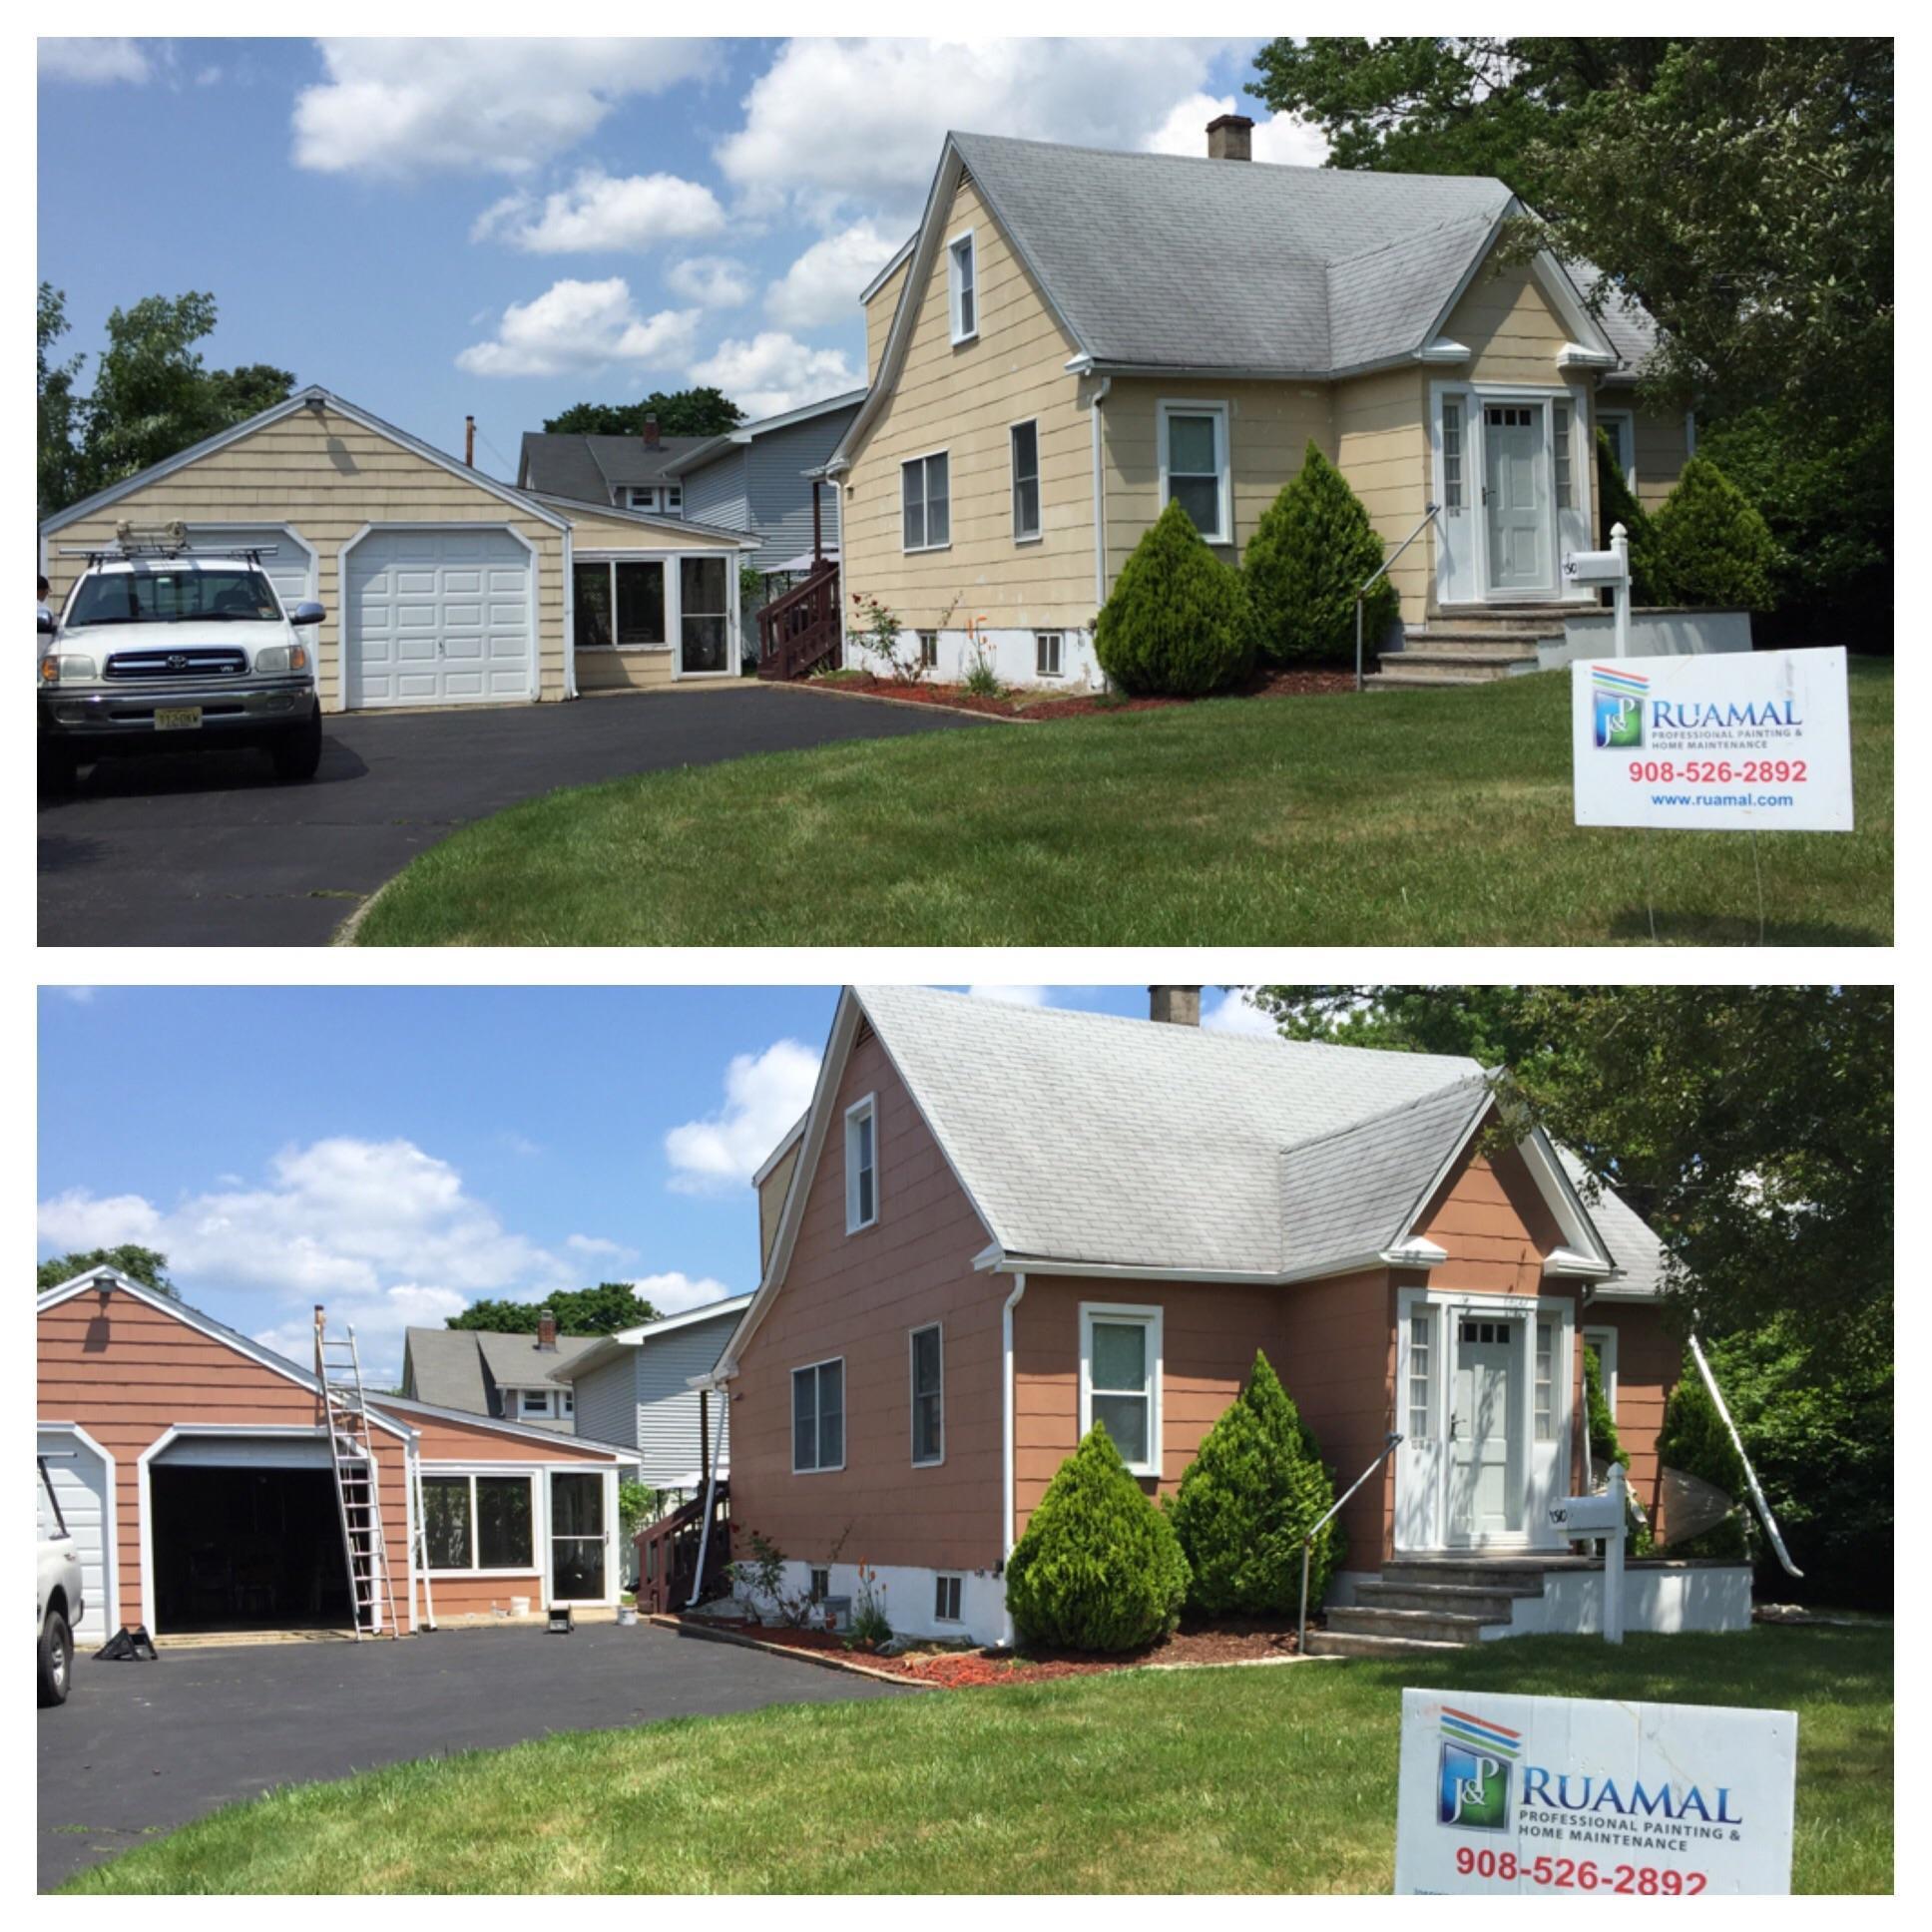 Ruamal Painting And Home Maintenance LLC image 1